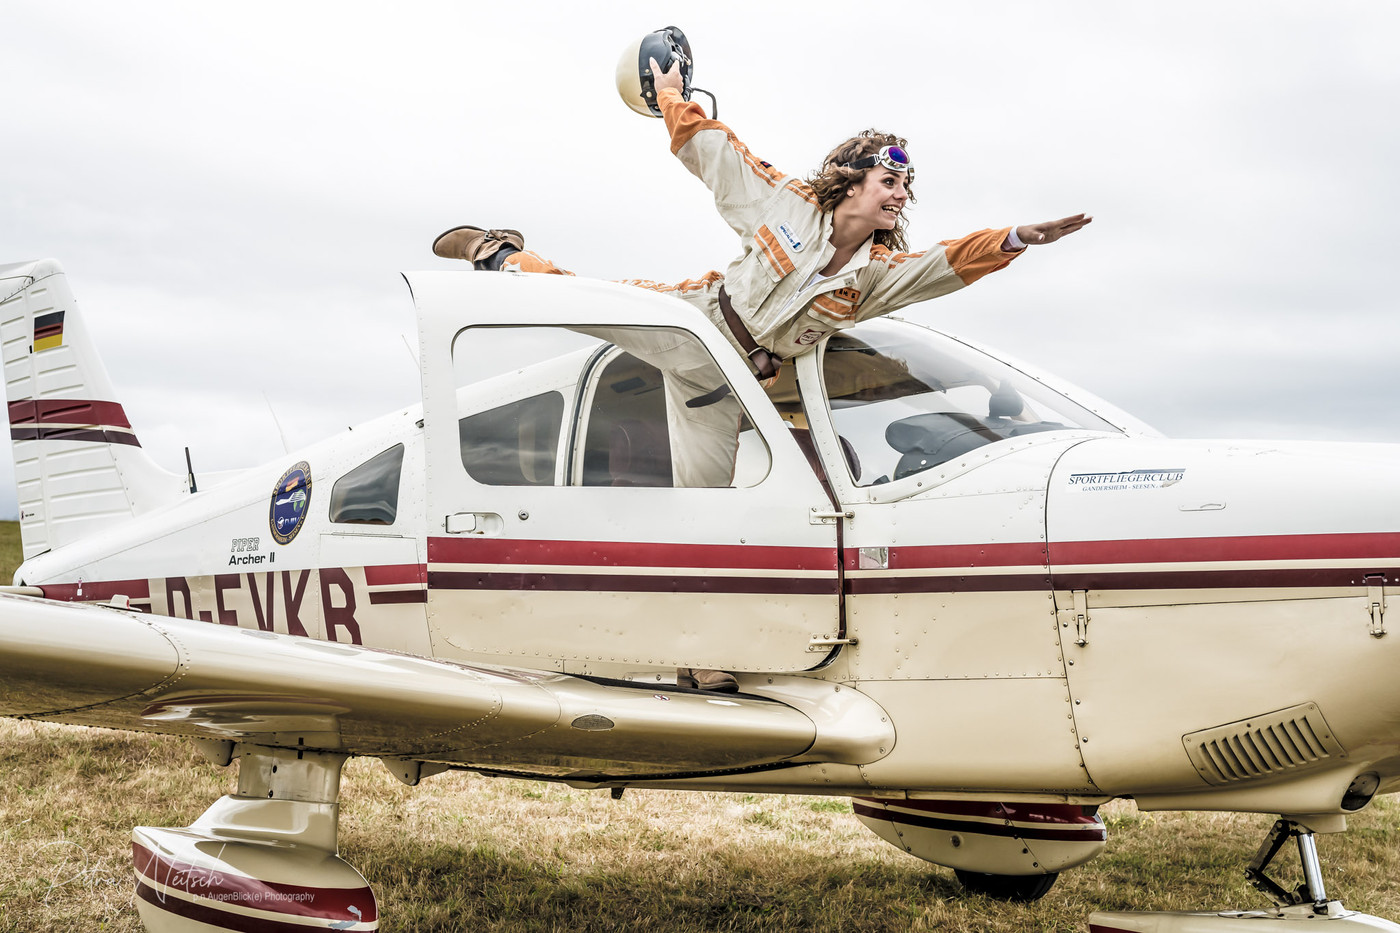 09-2019-Planes Girls and Rockn Roll-72.j